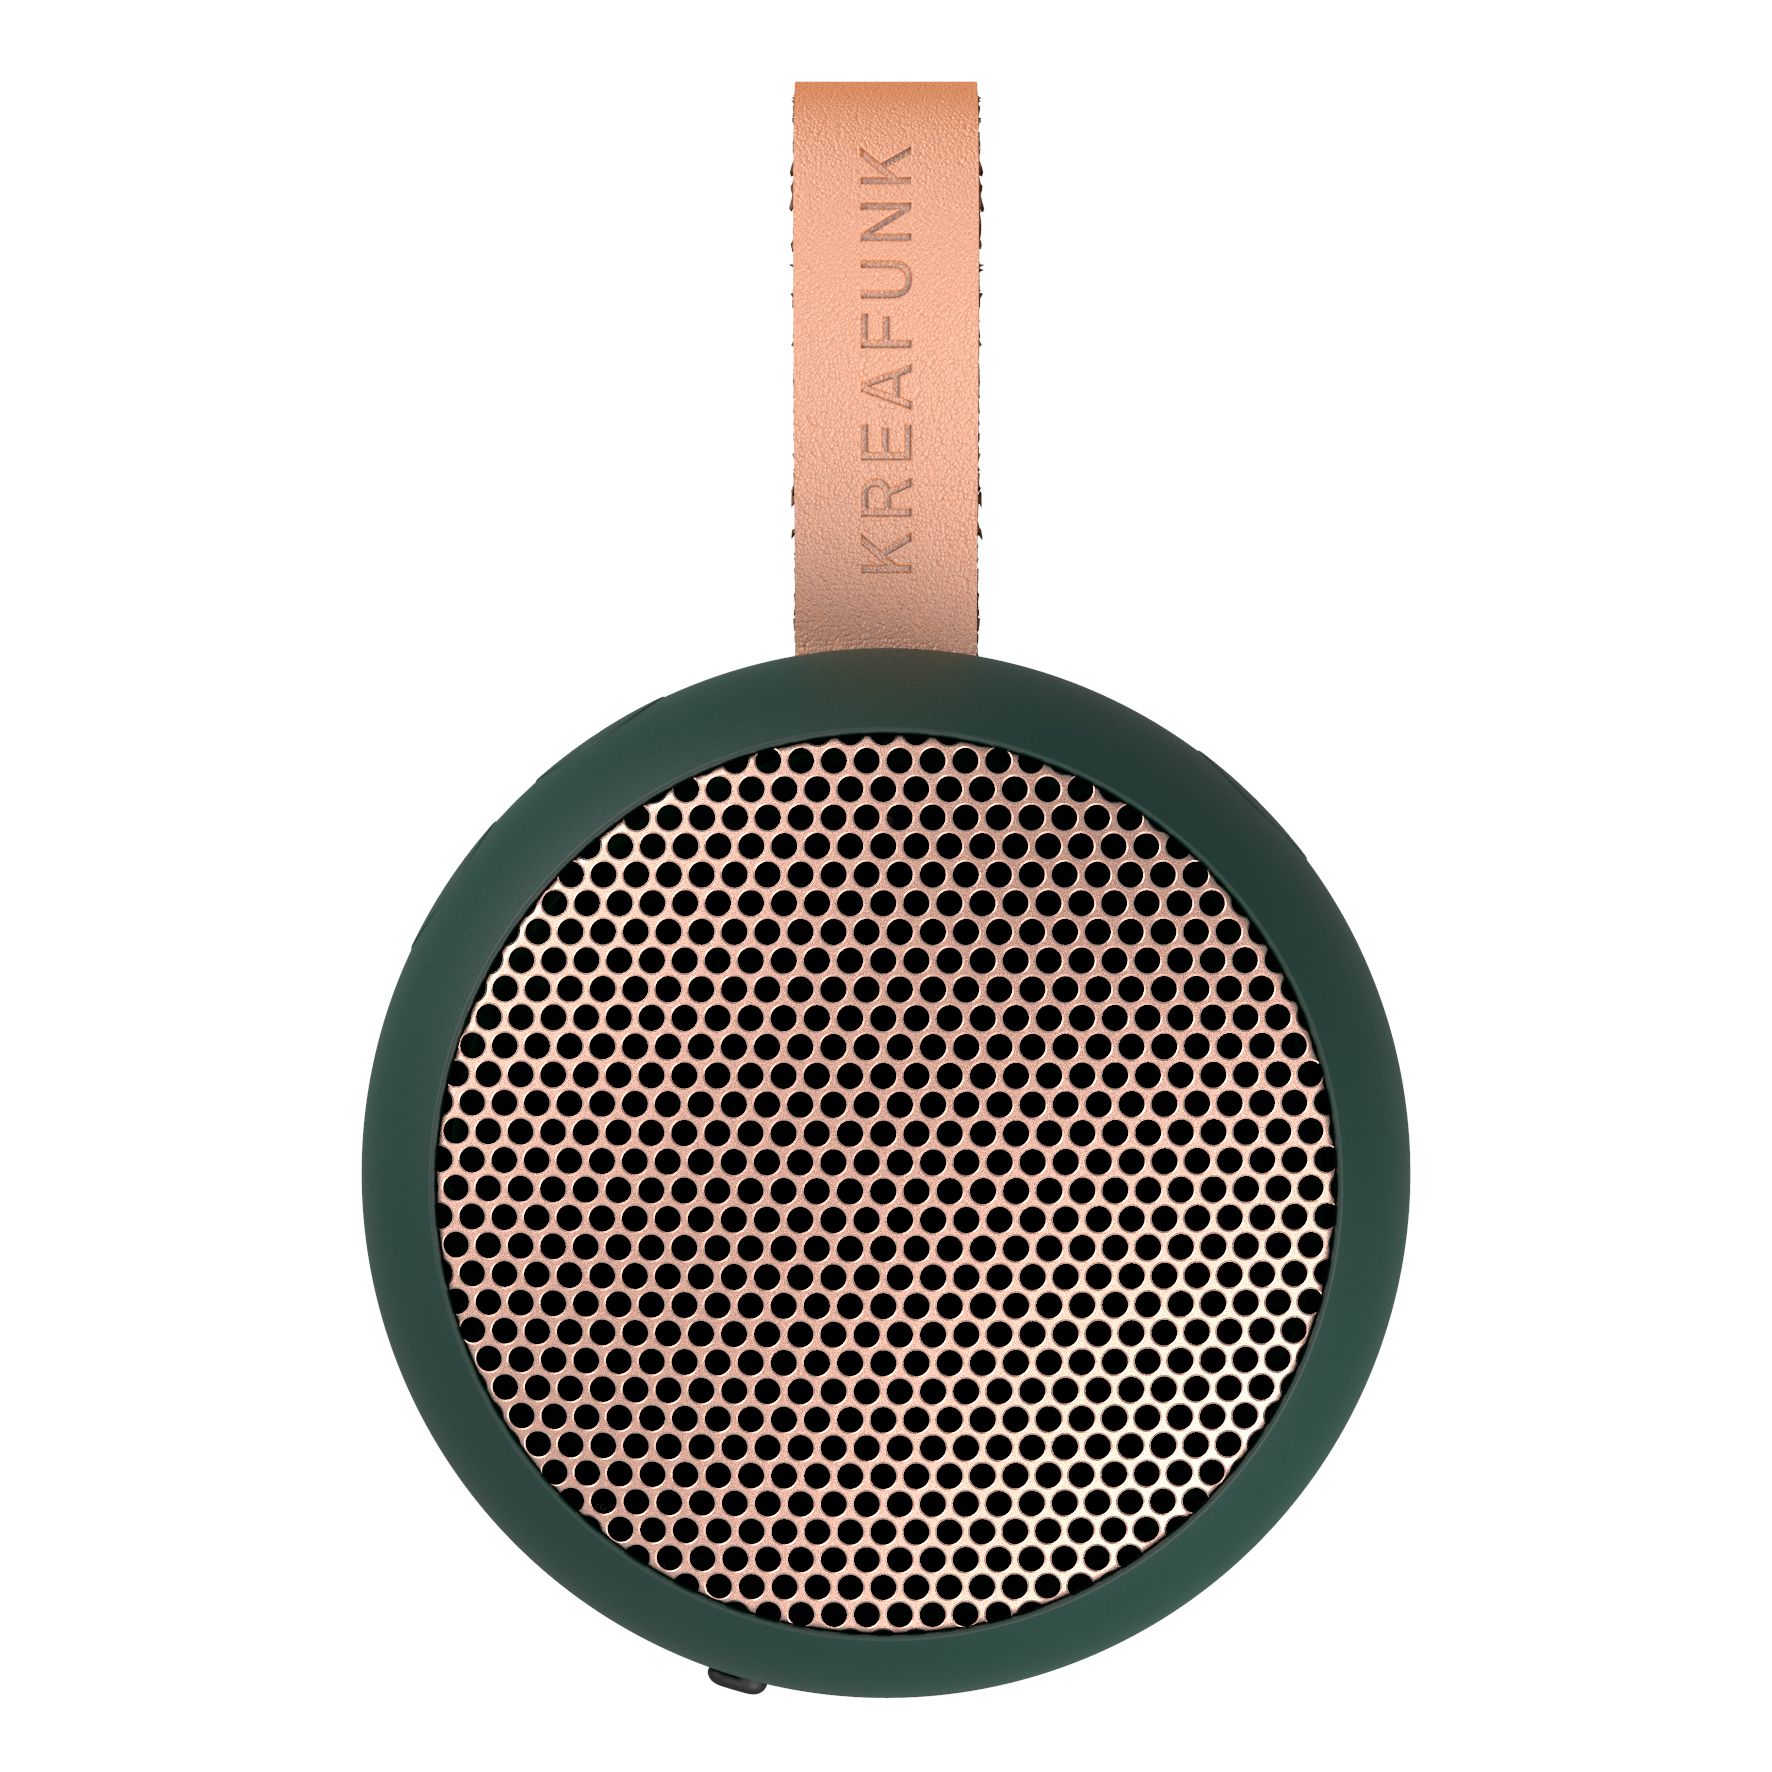 Enceinte portable 5.0 bluetooth rose et vert